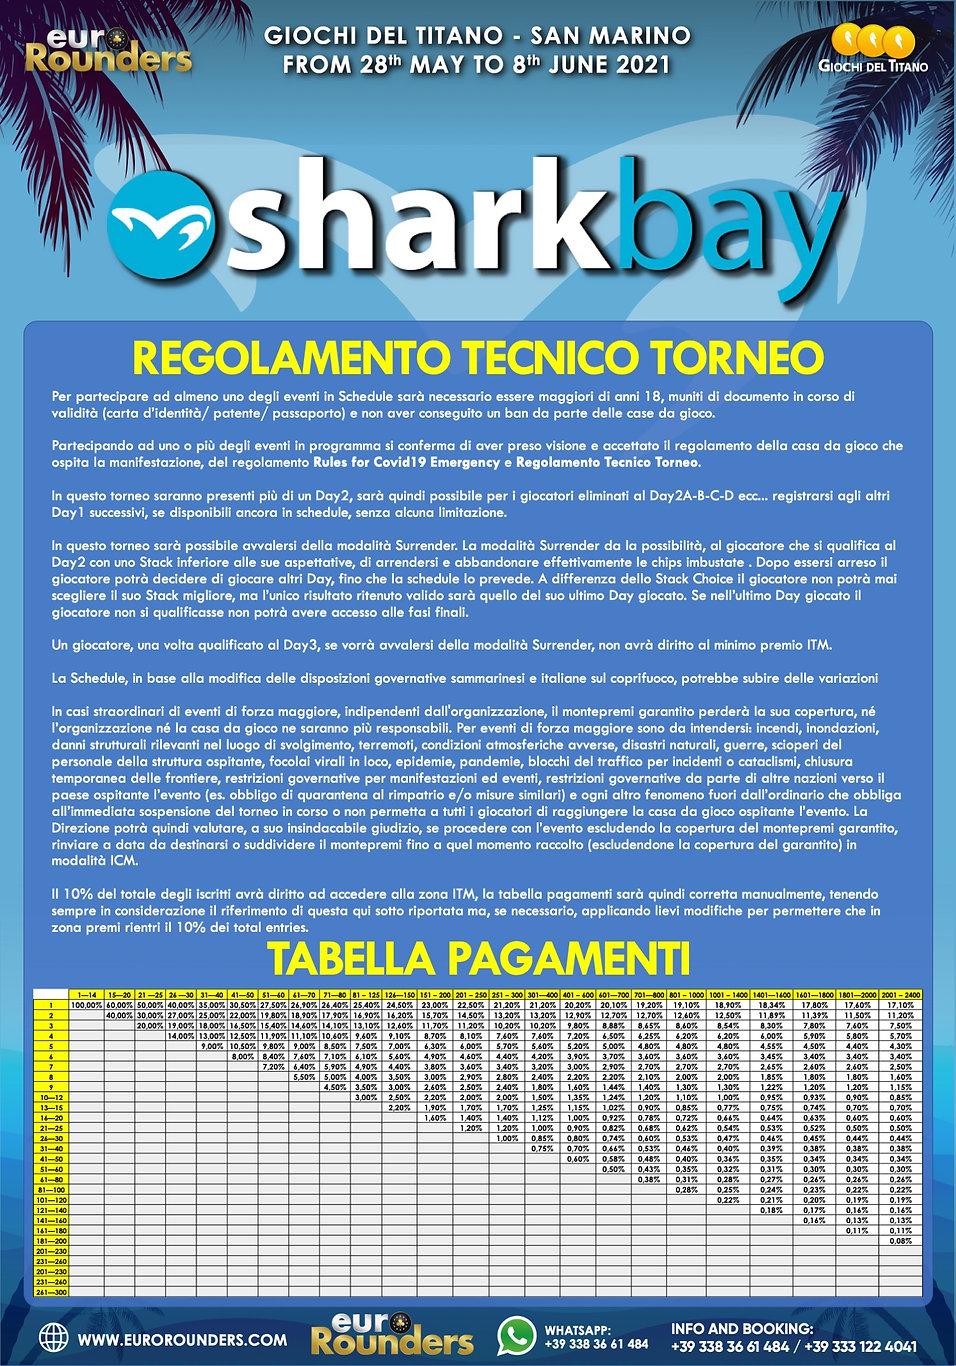 Sharkbay  Regolamento Tecnico.jpg